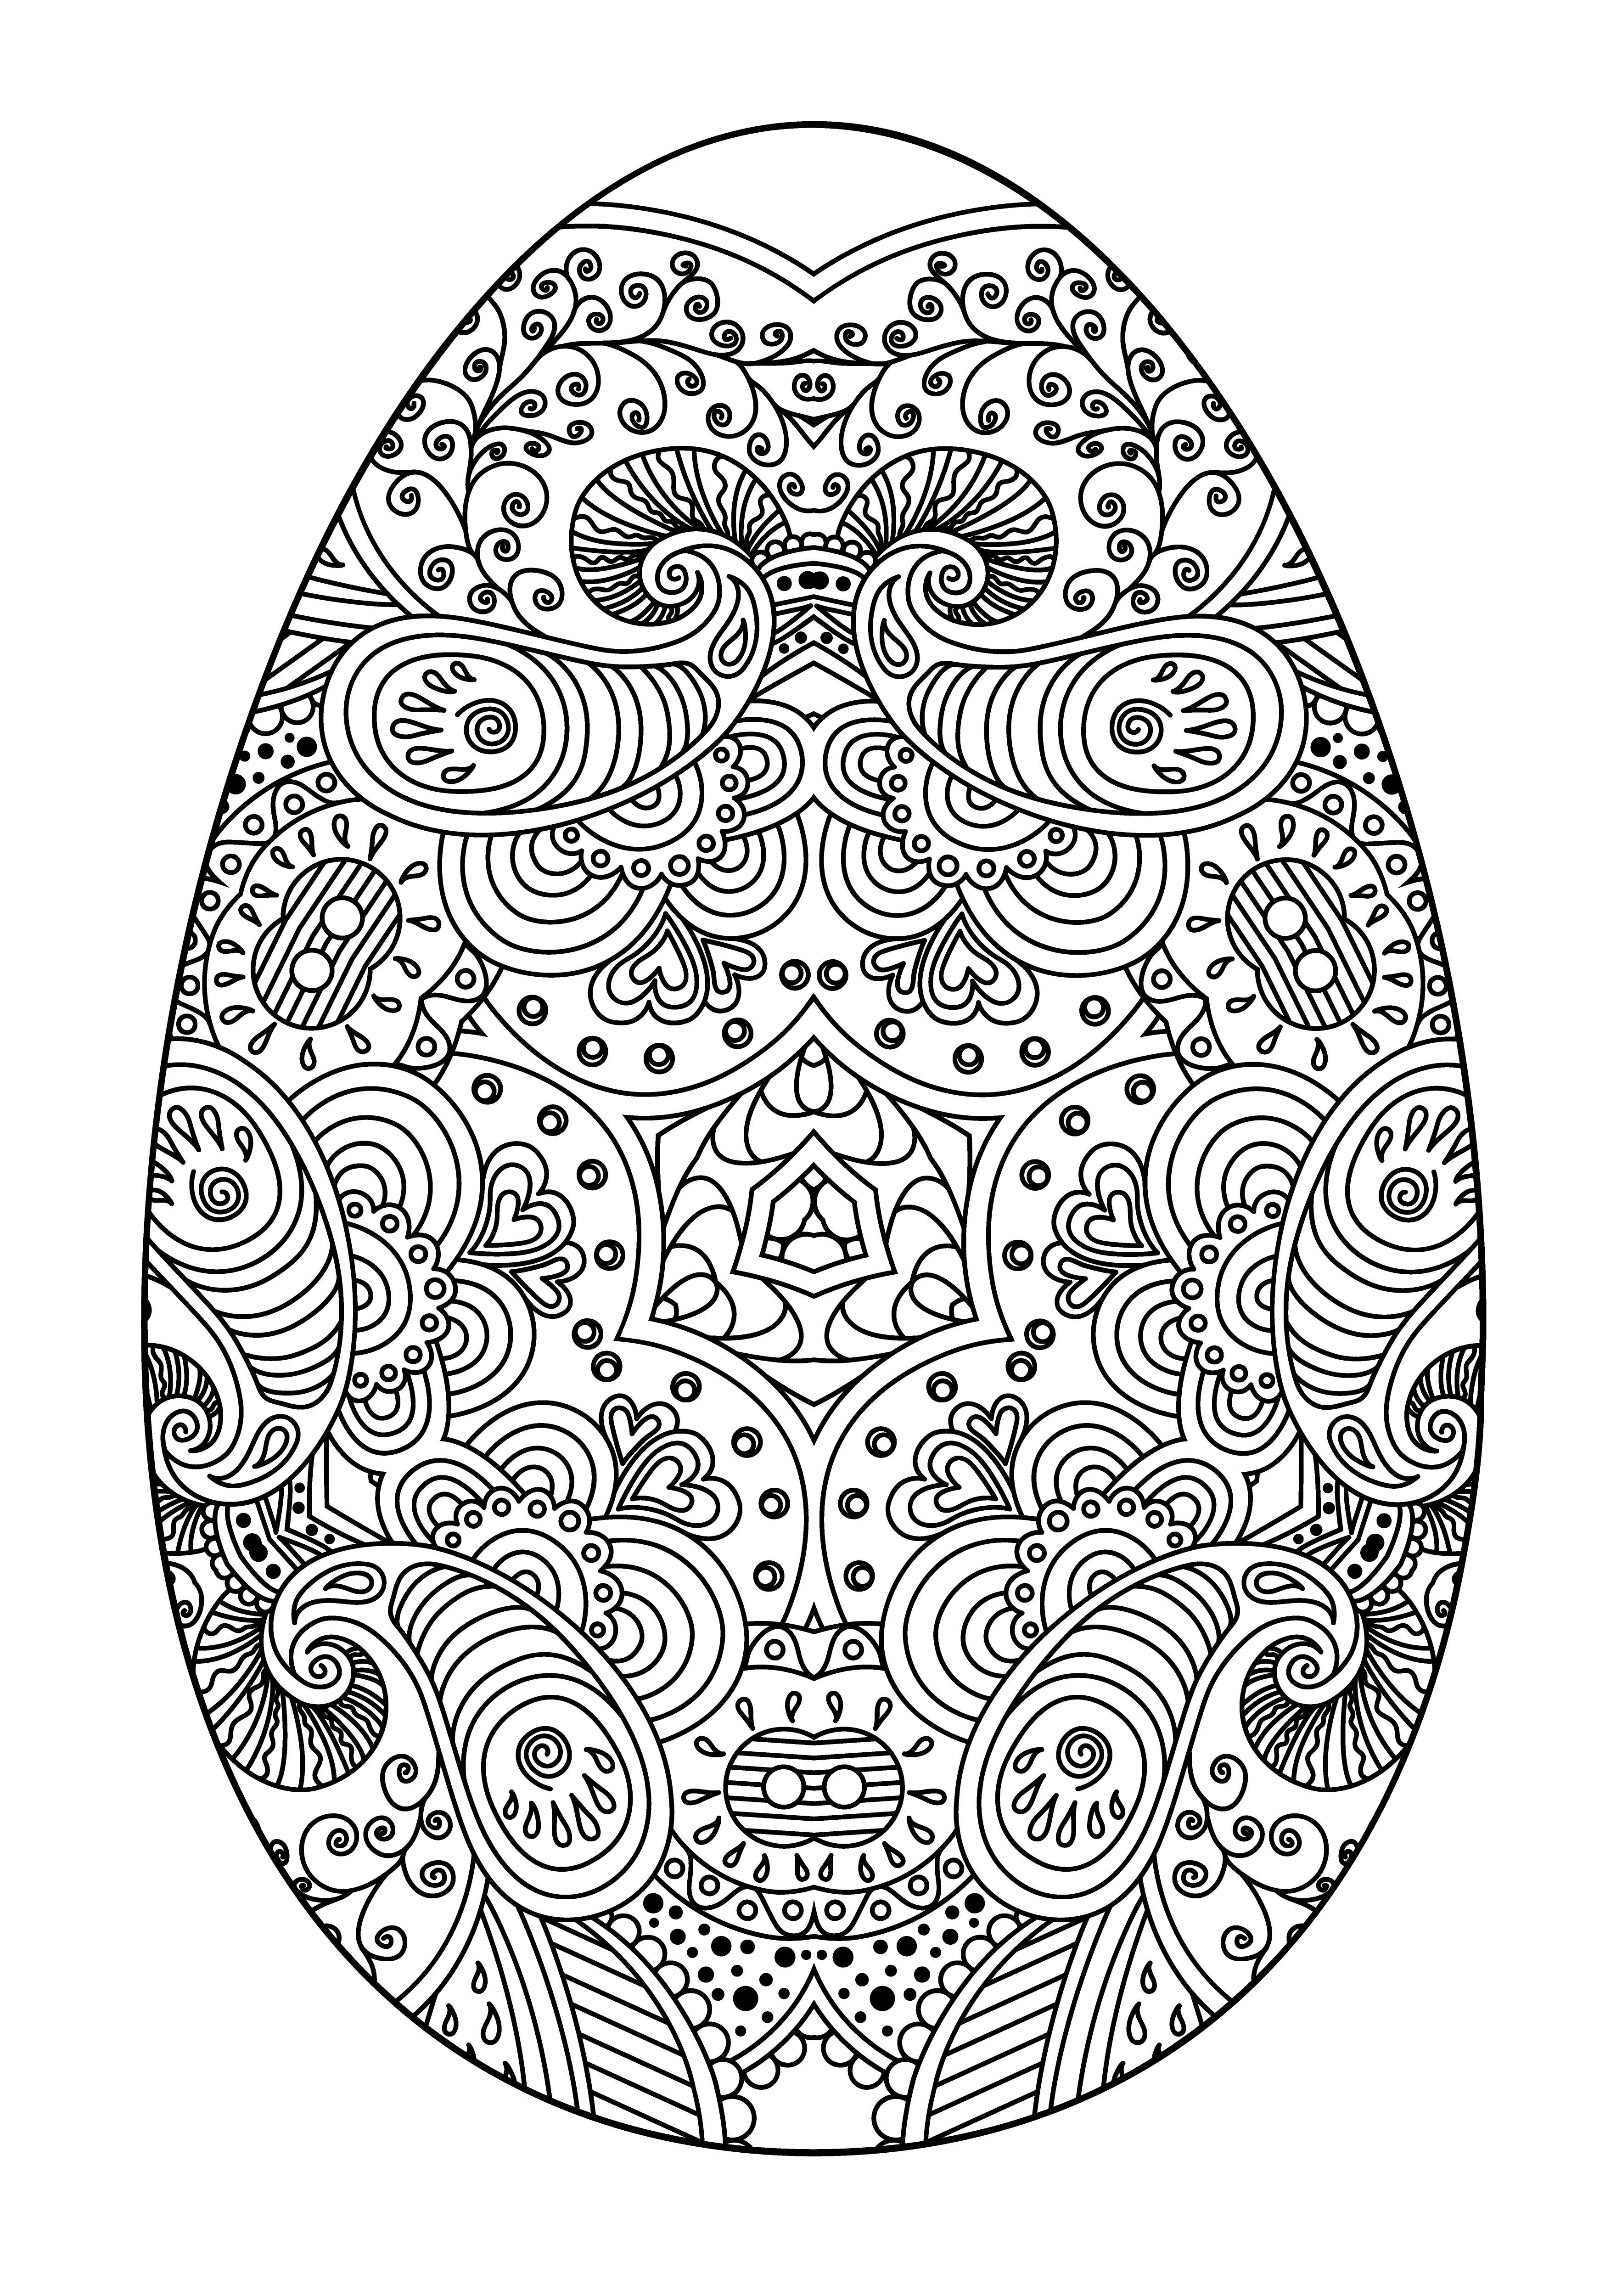 разрисованное яйцо на пасху праздники раскраски антистресс